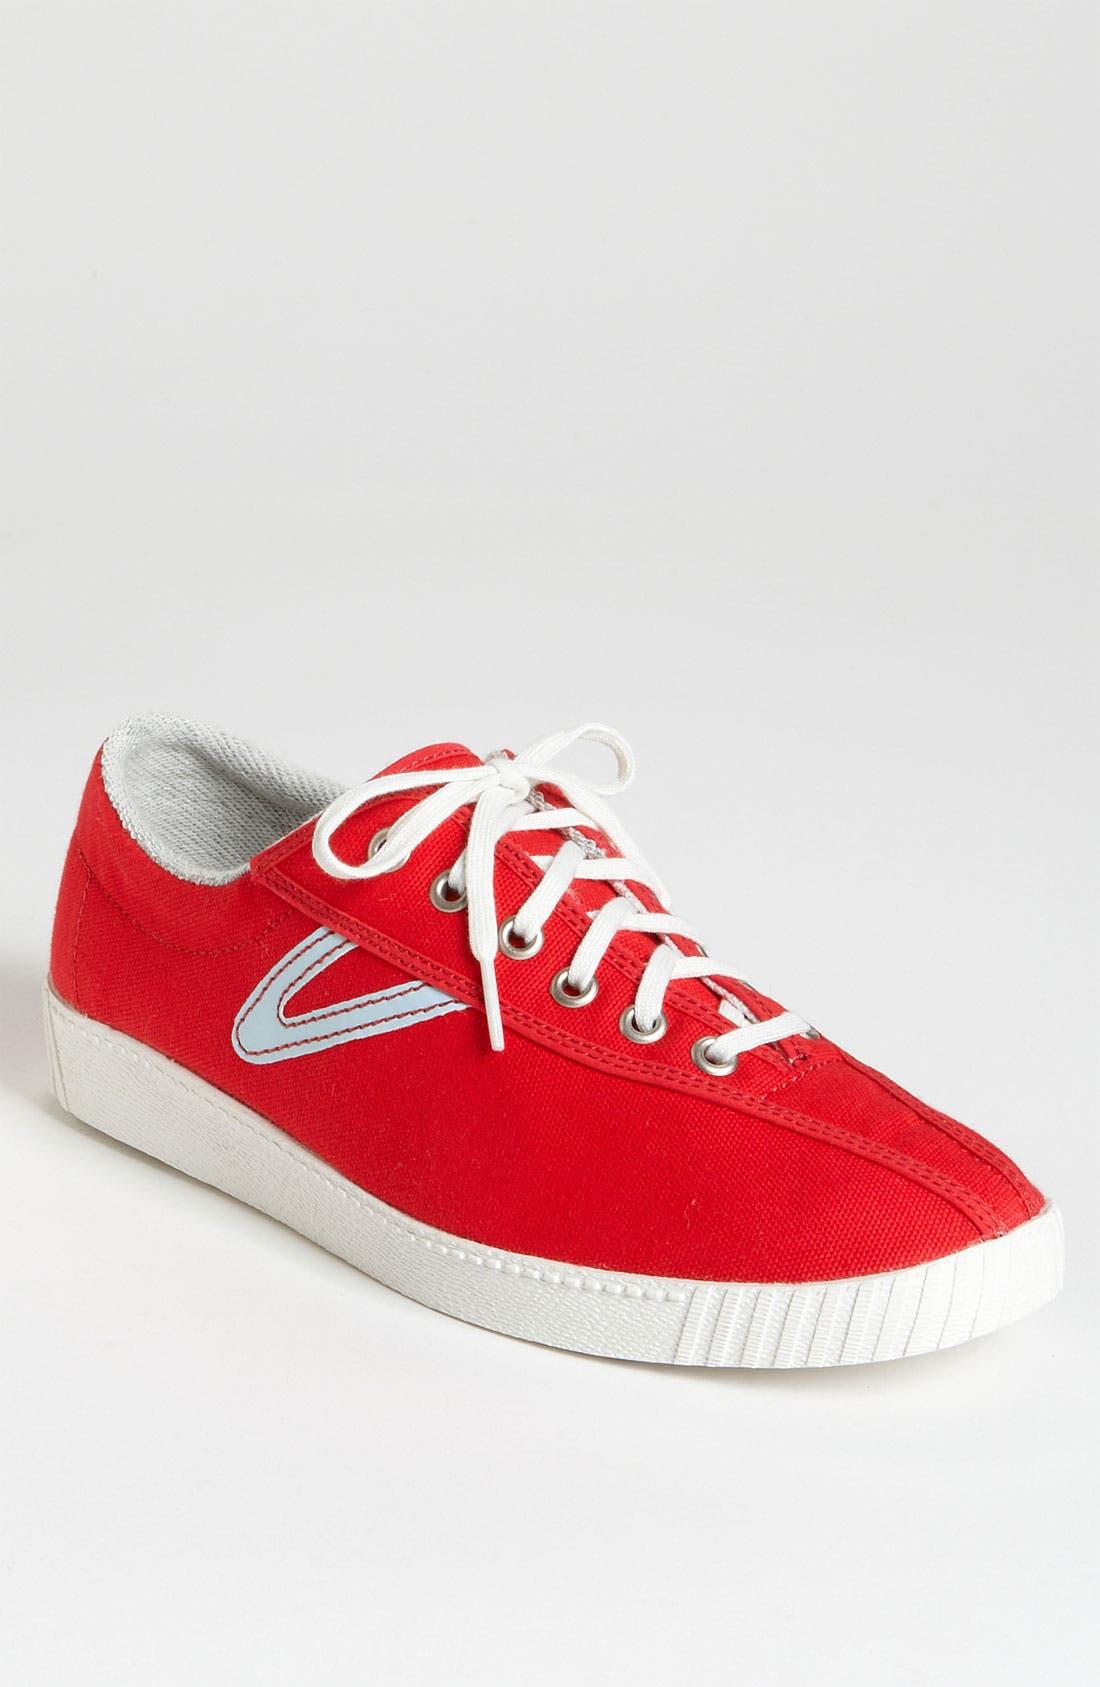 Main Image - Tretorn 'Nylite' Sneaker